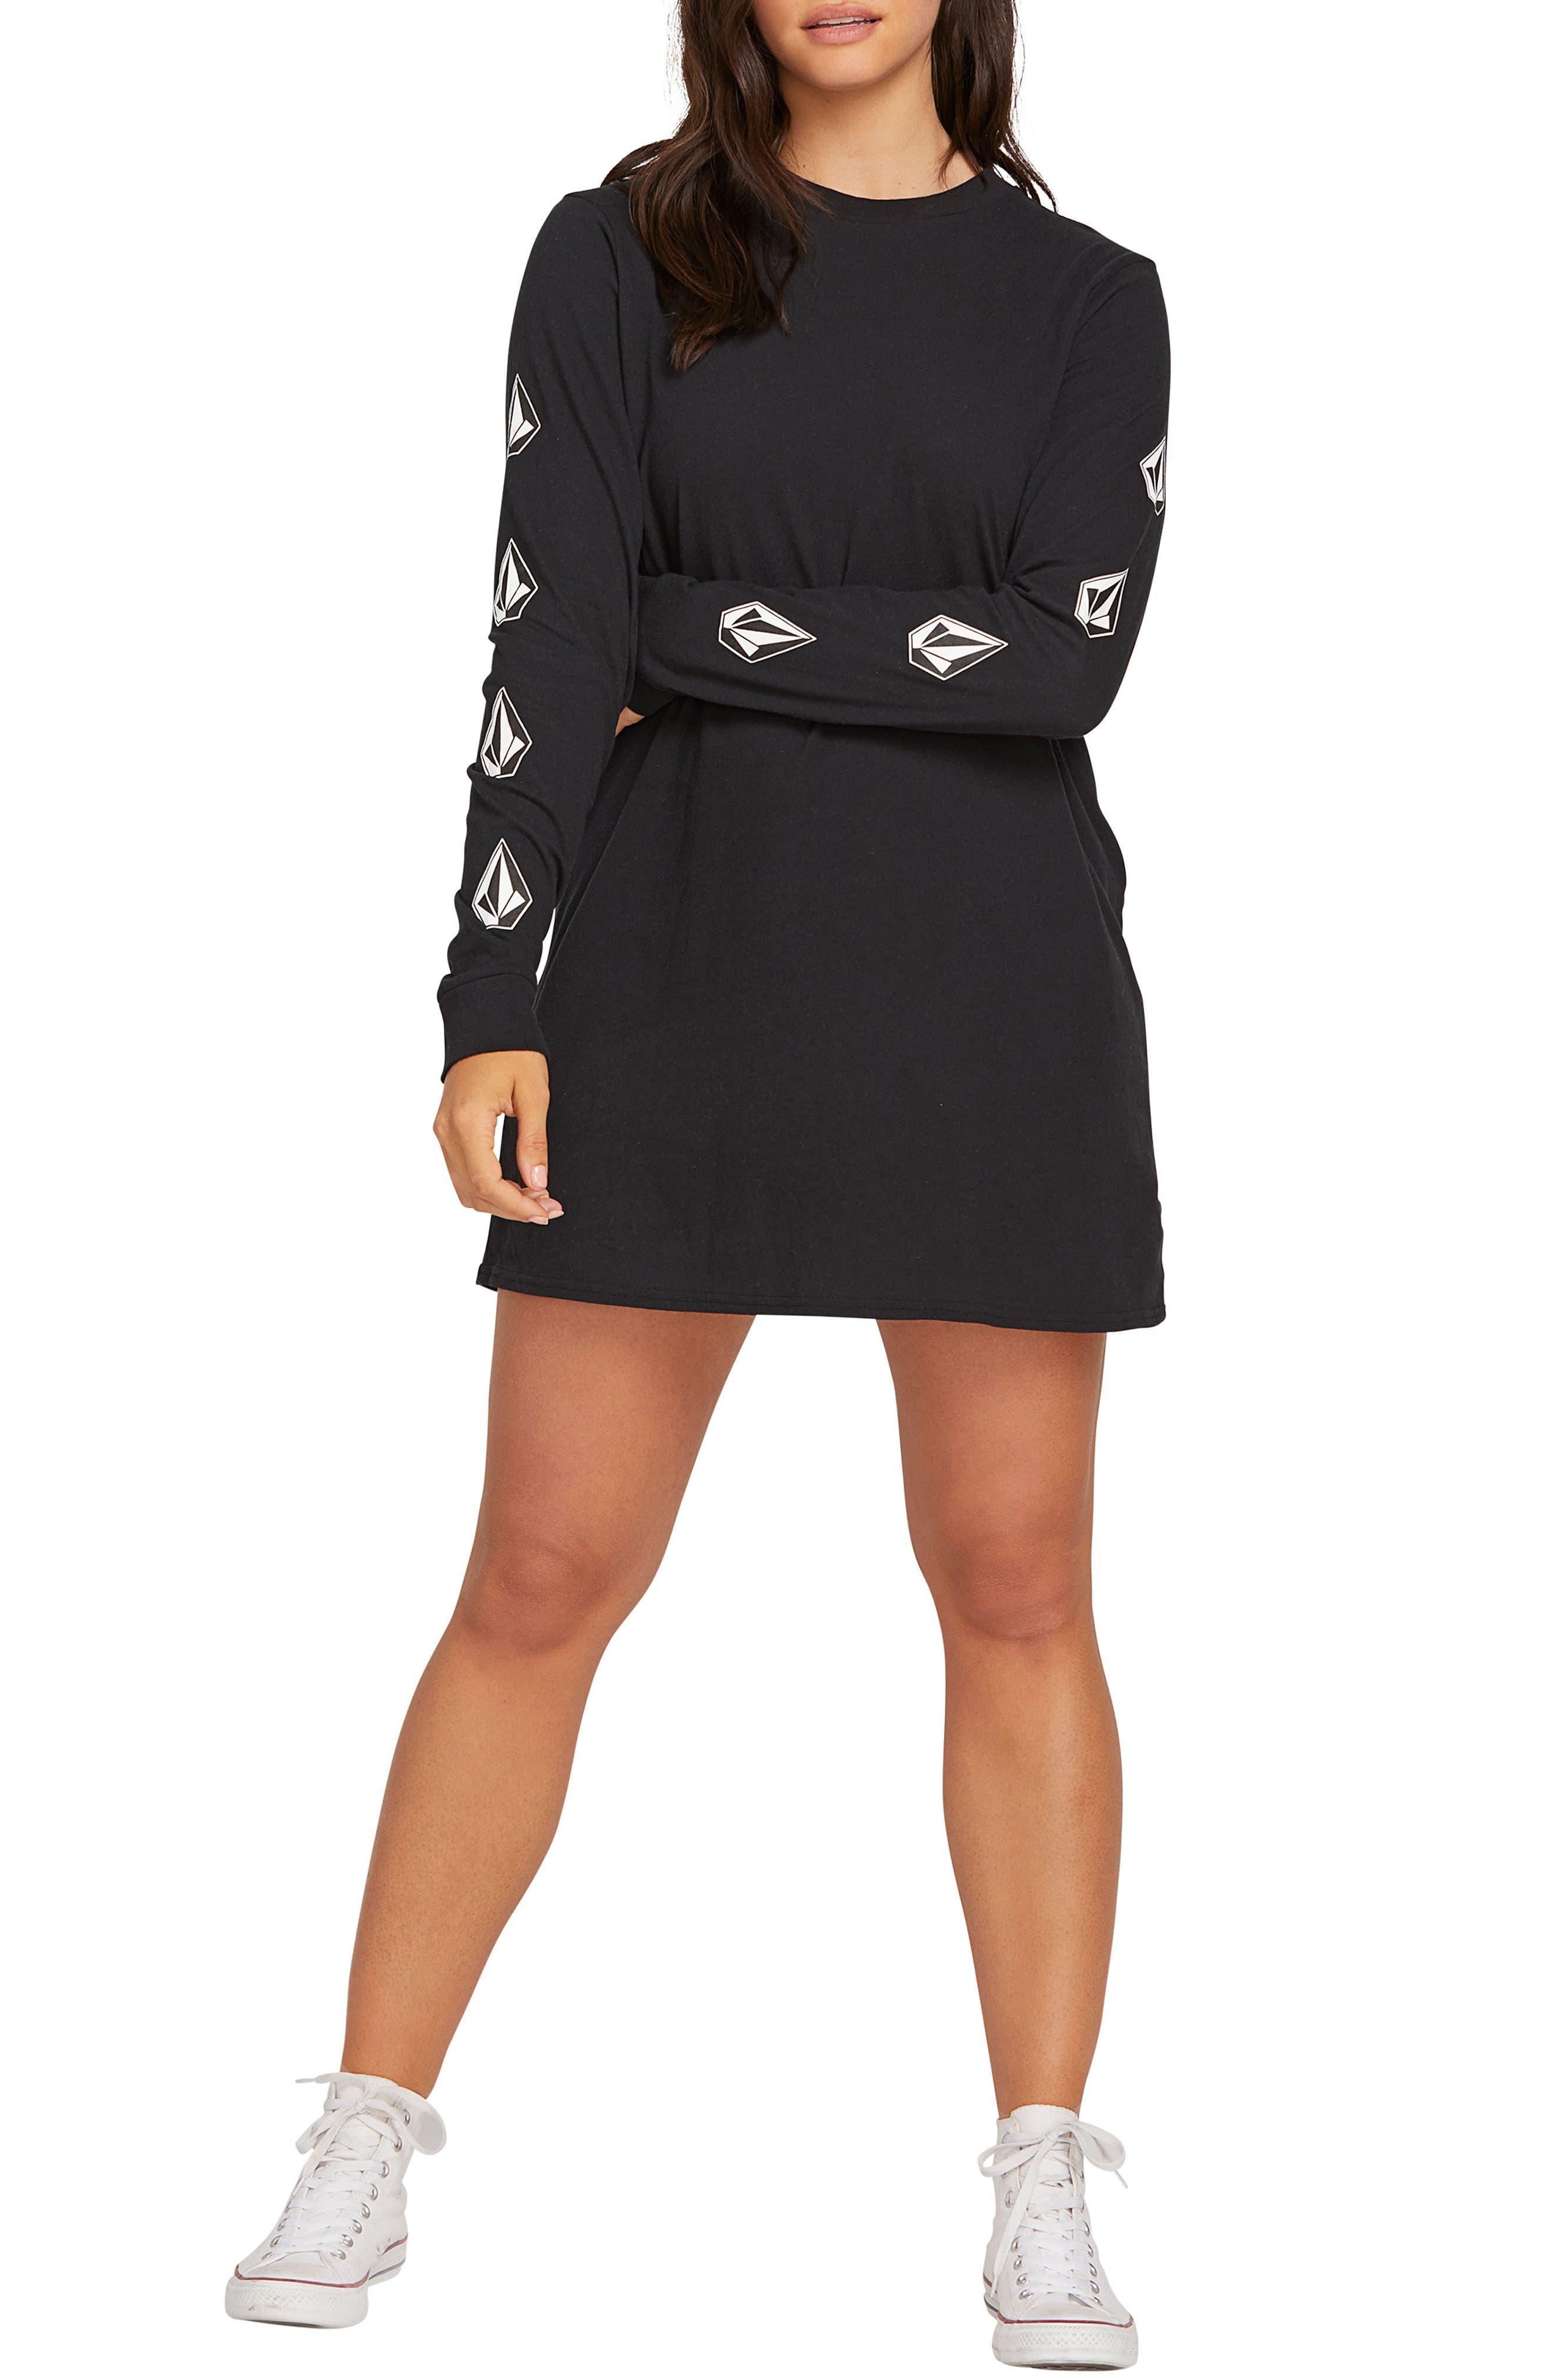 Plus Size Volcom What A Trip T-Shirt Dress, Black